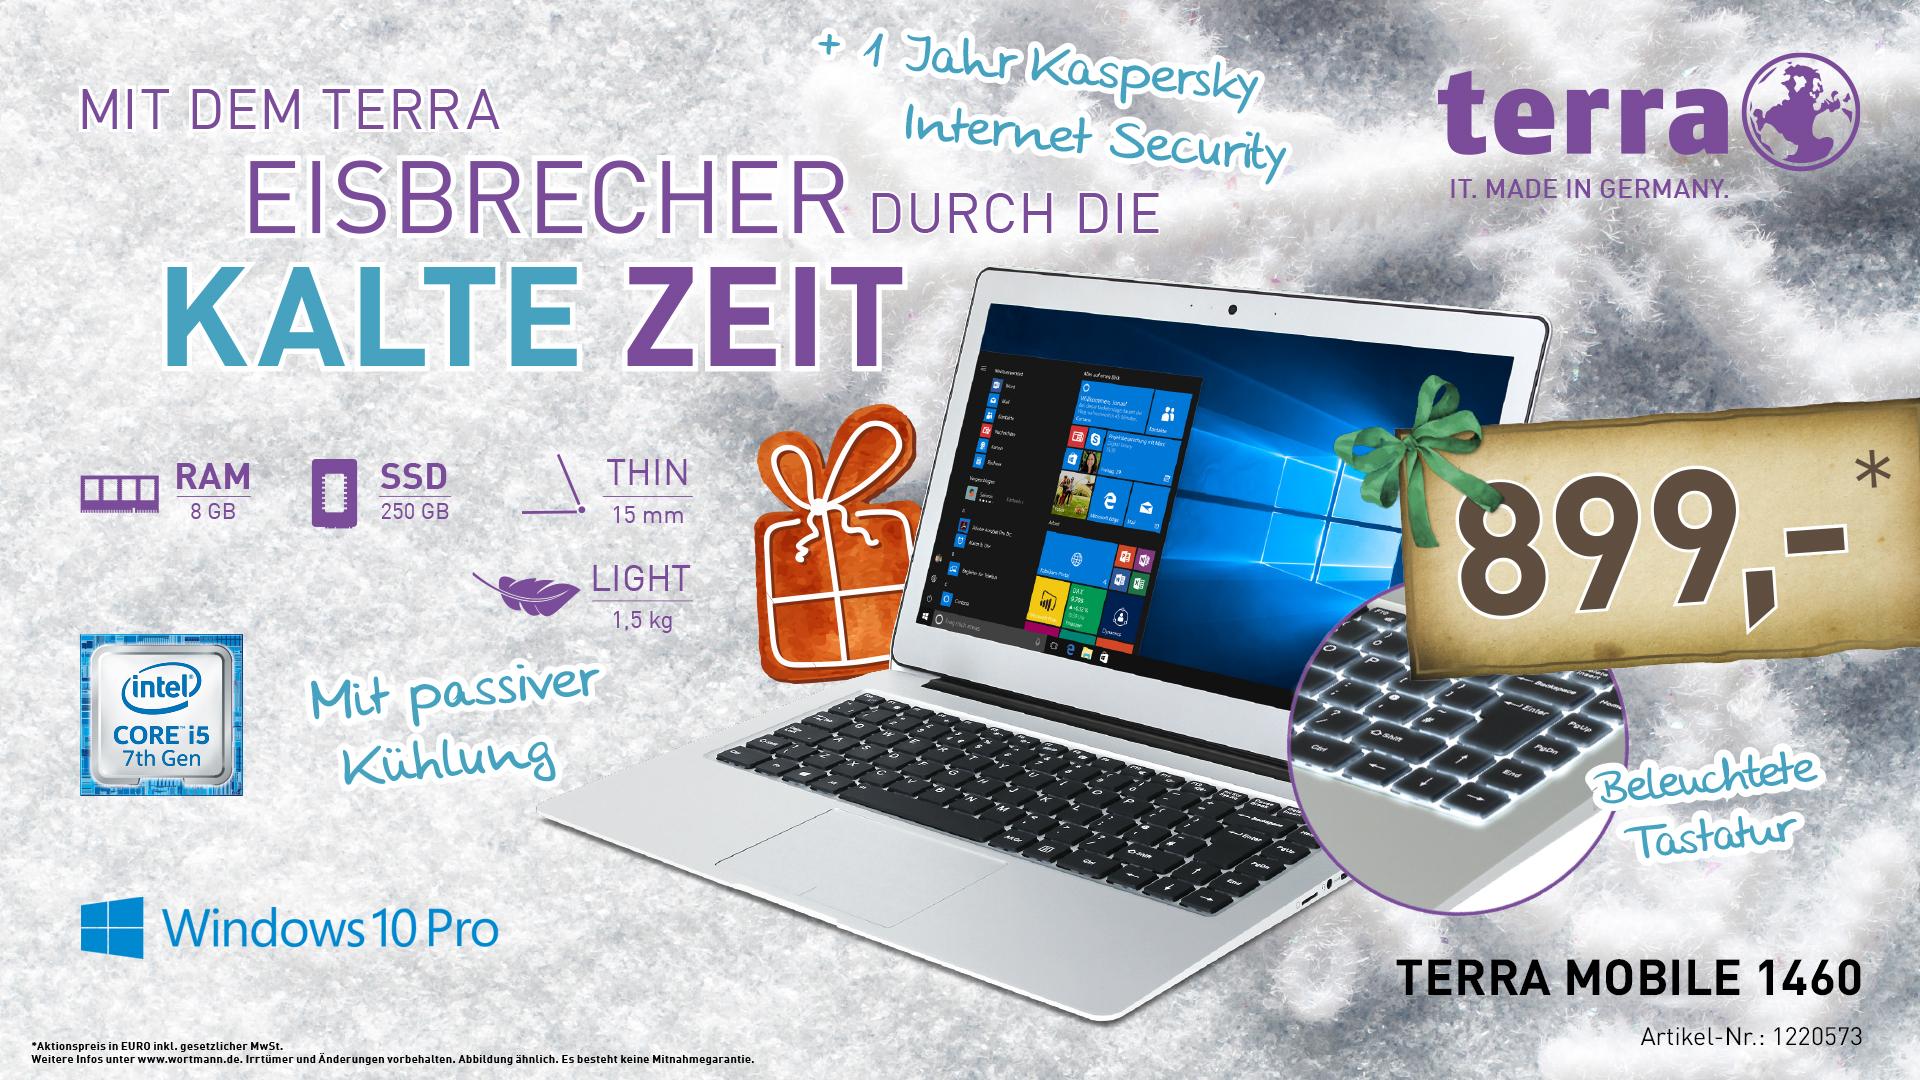 Terra-mobile-1460